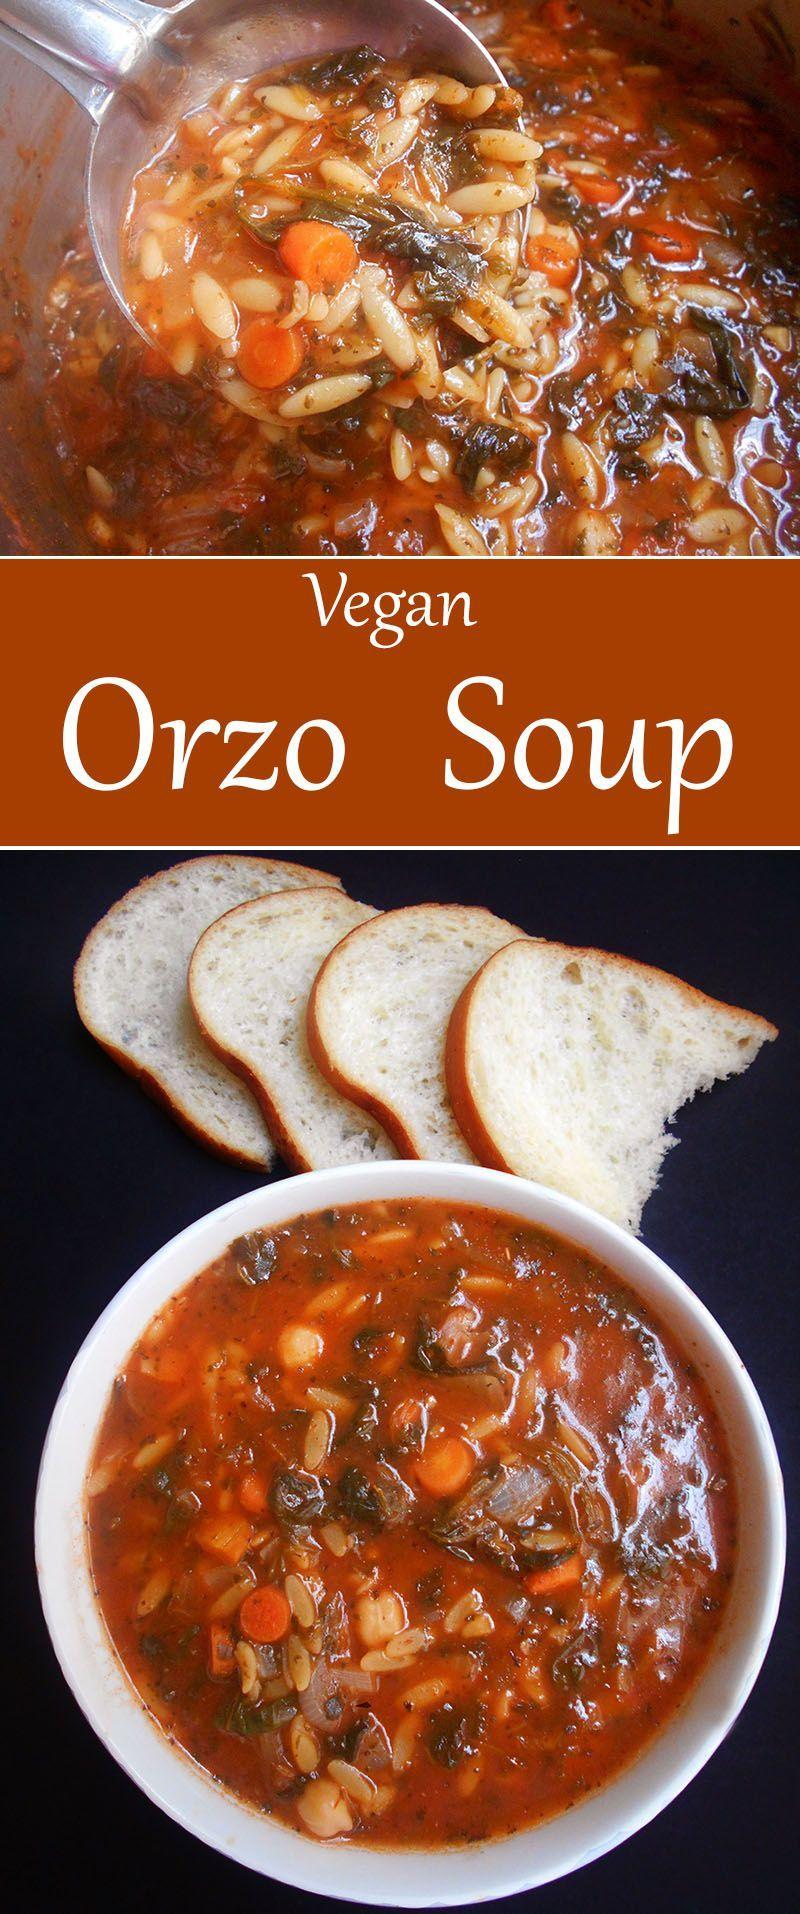 Orzo Soup Recipe Vegan